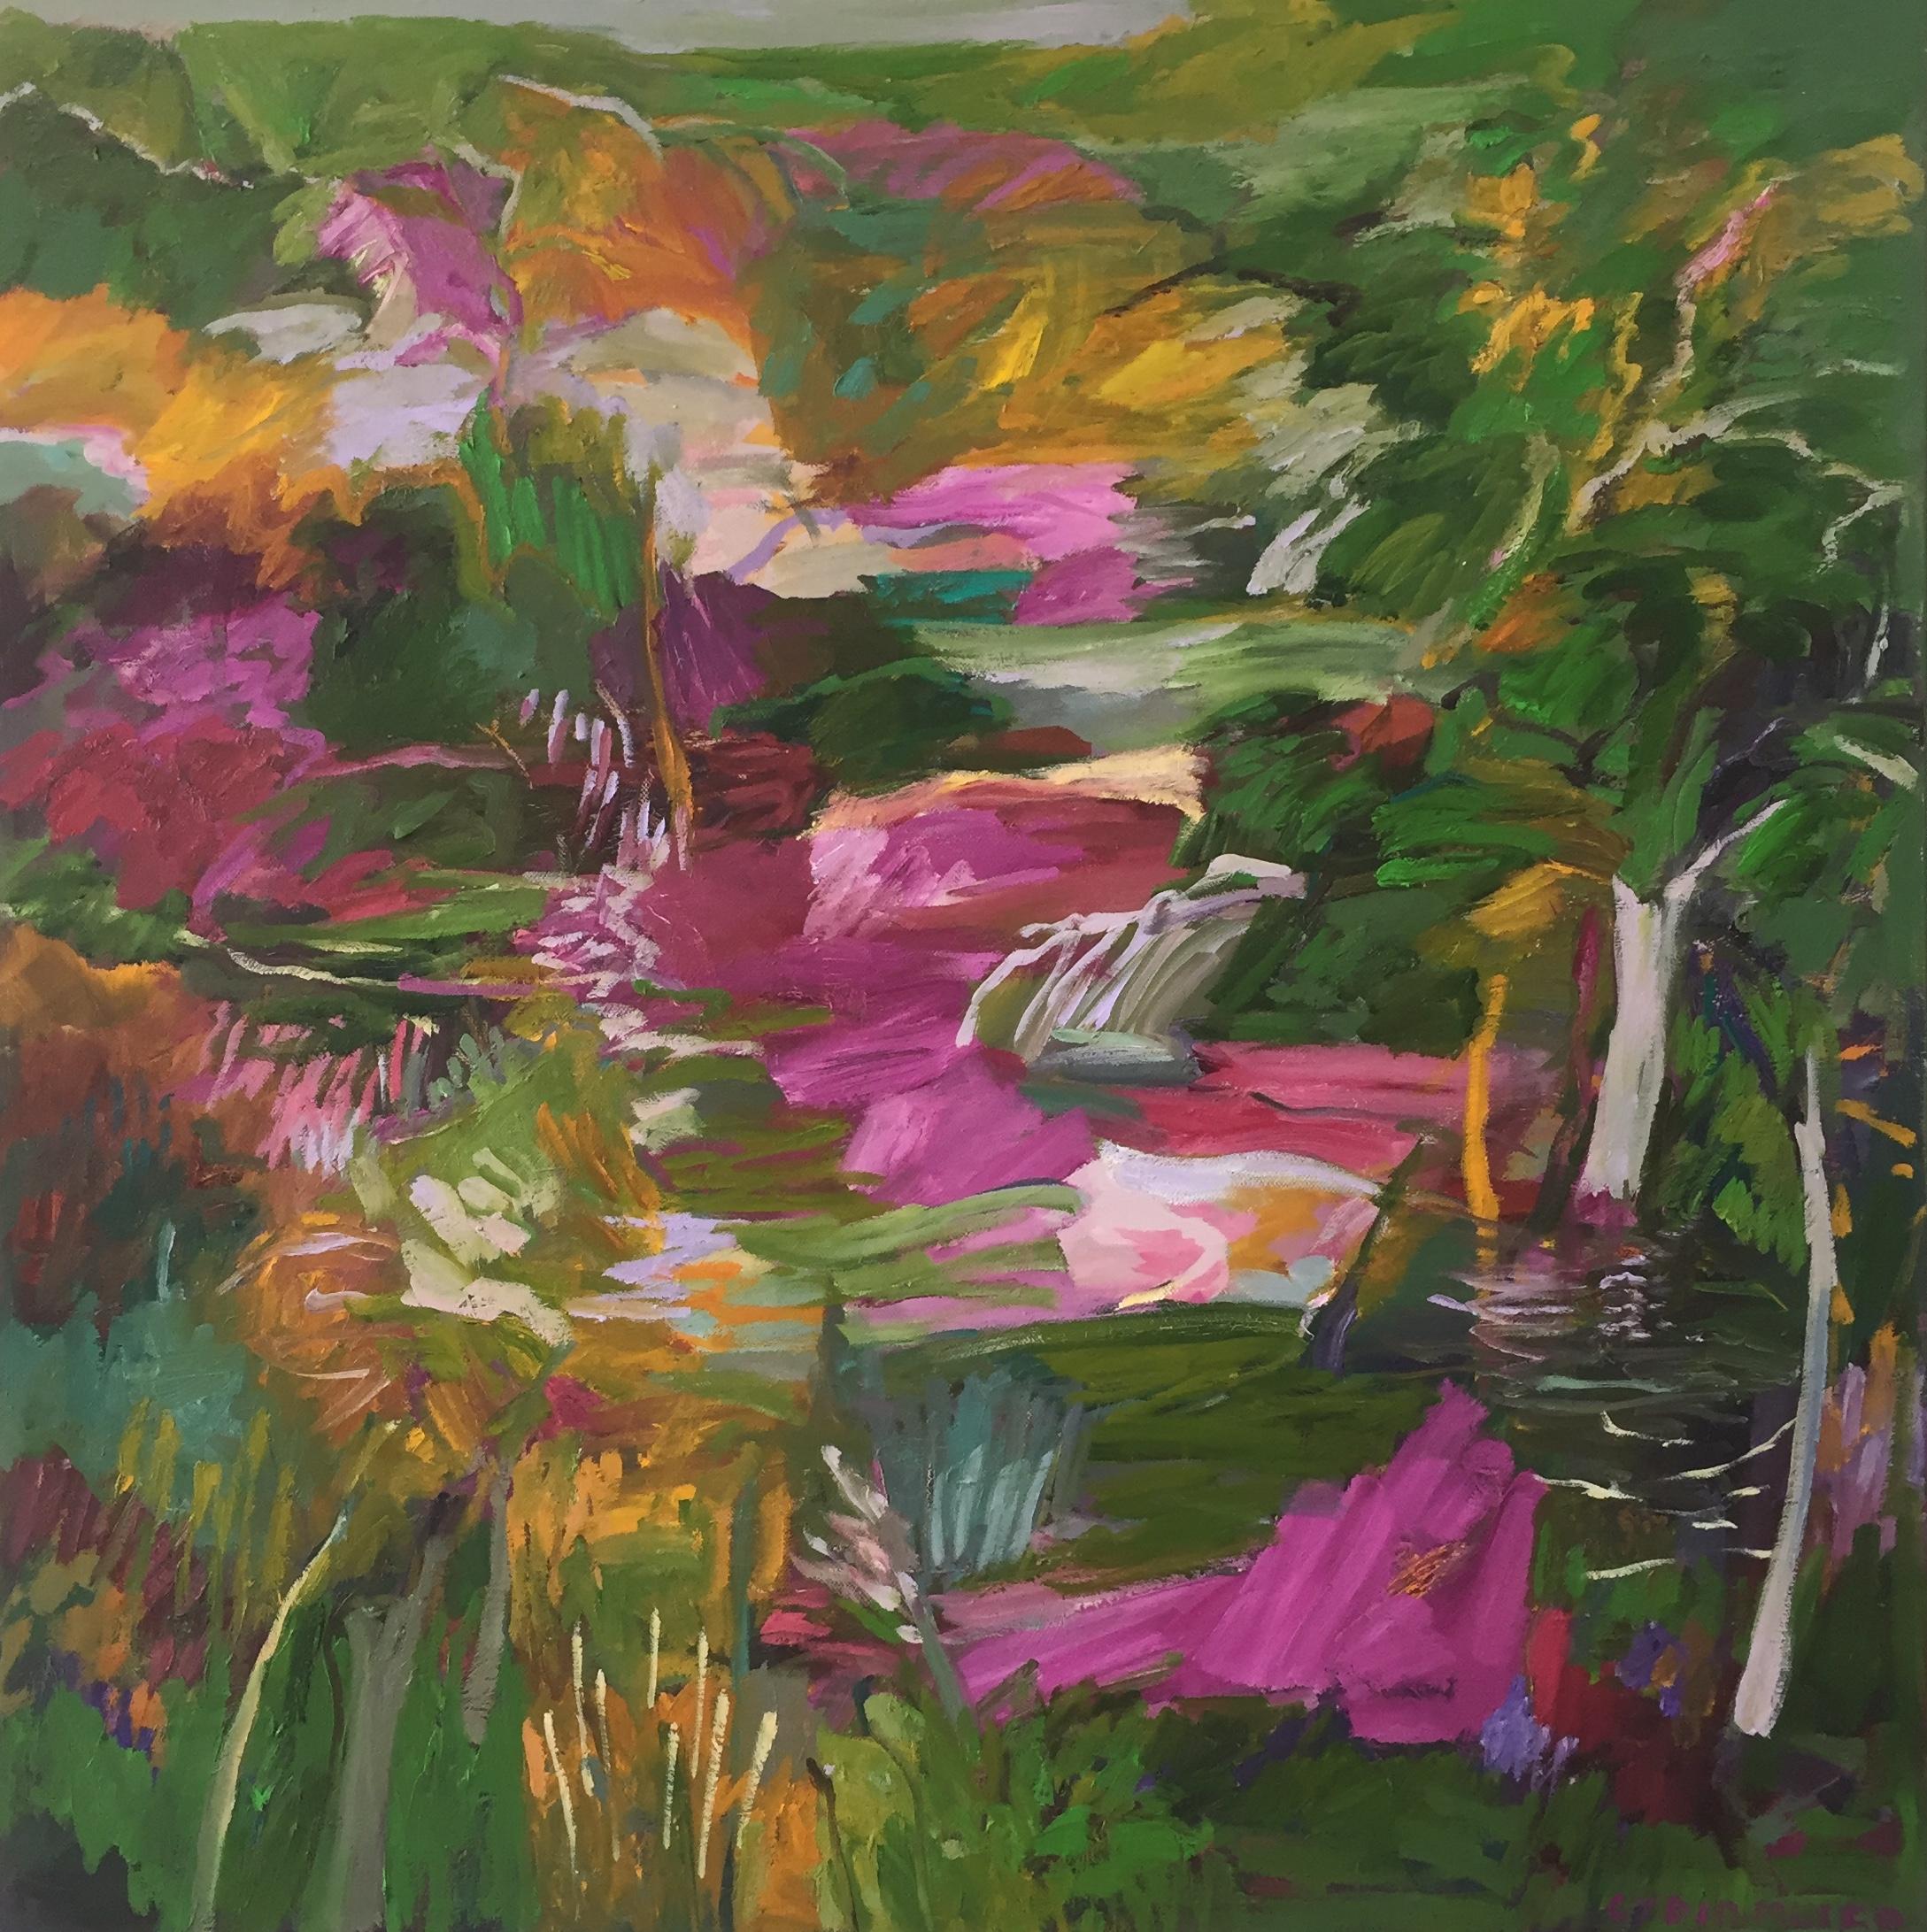 Lydia Miller  Magenta  2018 oil on canvas 76 x76cm $900.00